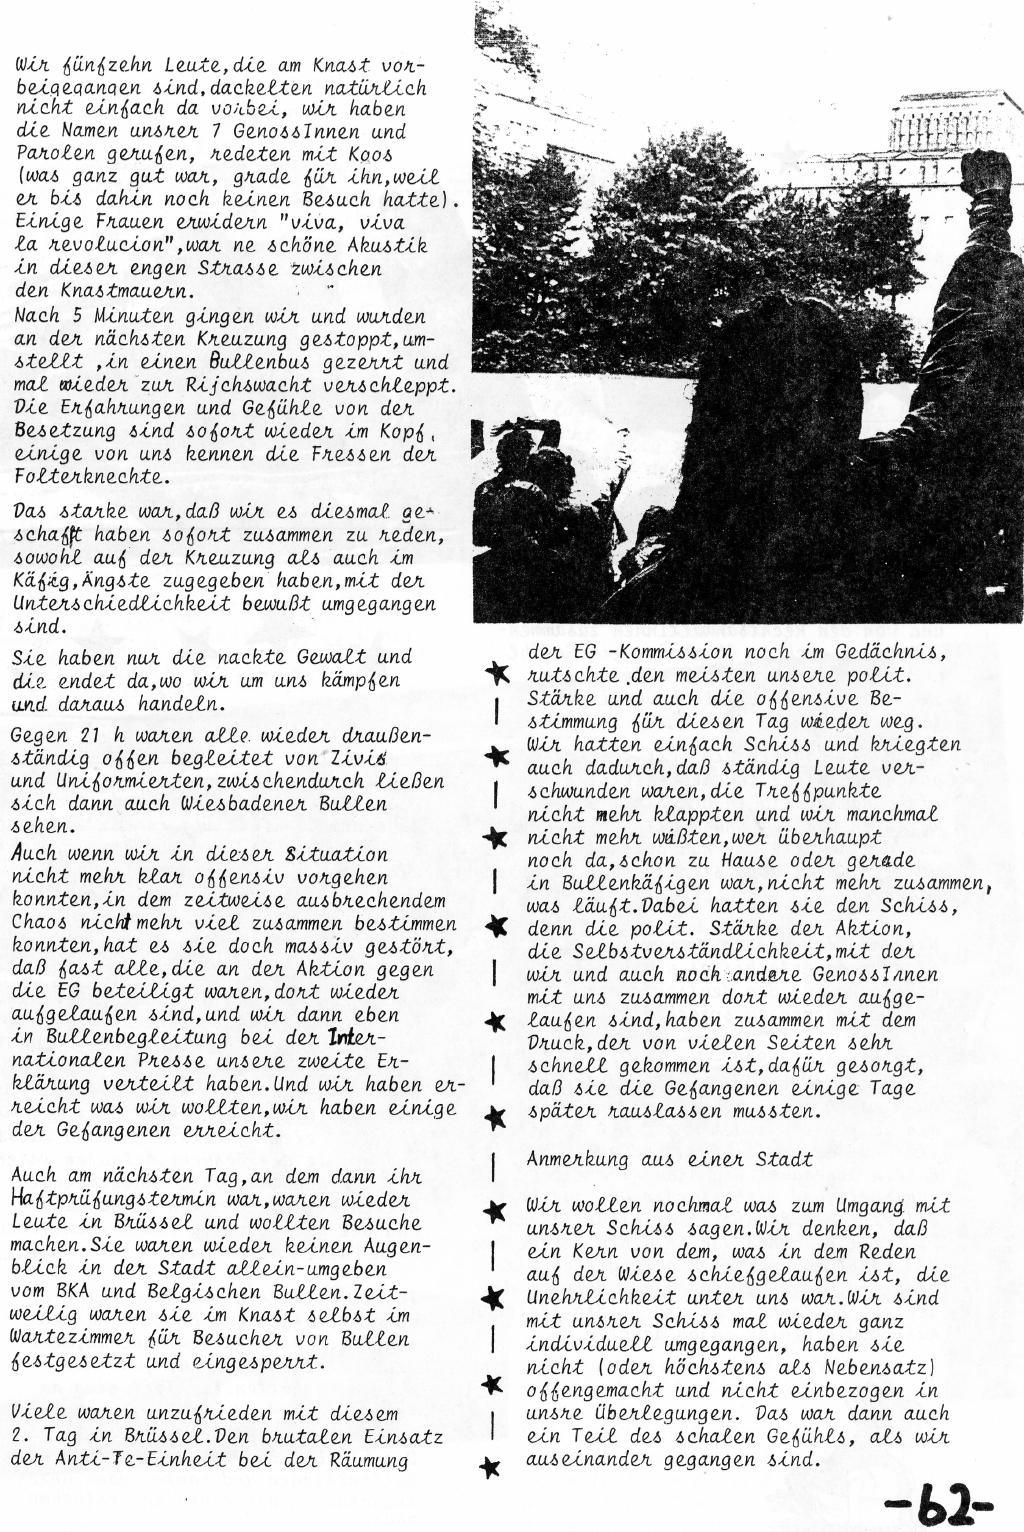 Belgien_Doku_Besetzung_EG_Kommission_1989_064